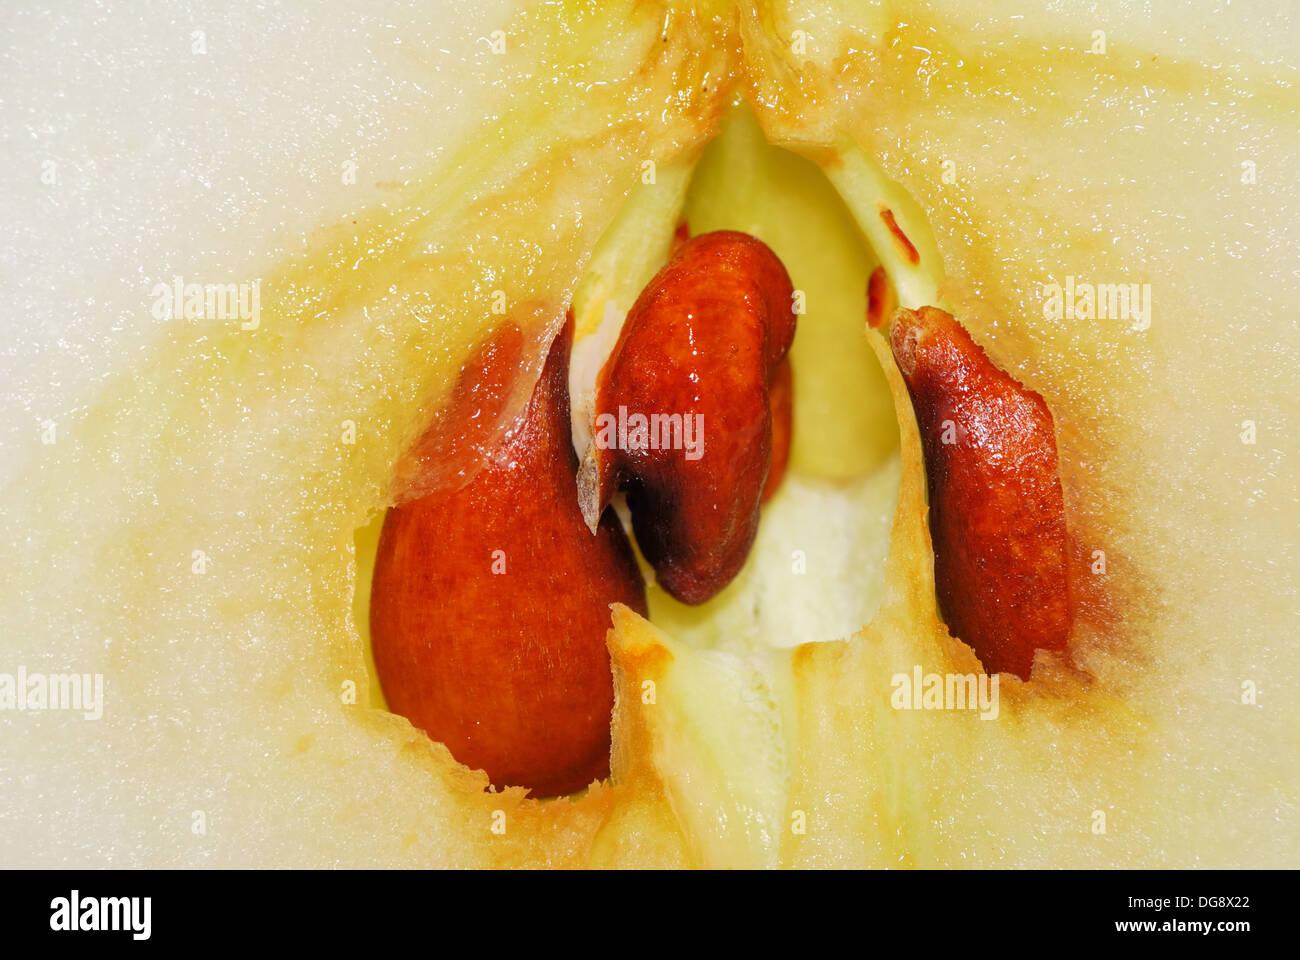 Apple Core macro closeup shot showing seeds - Stock Image